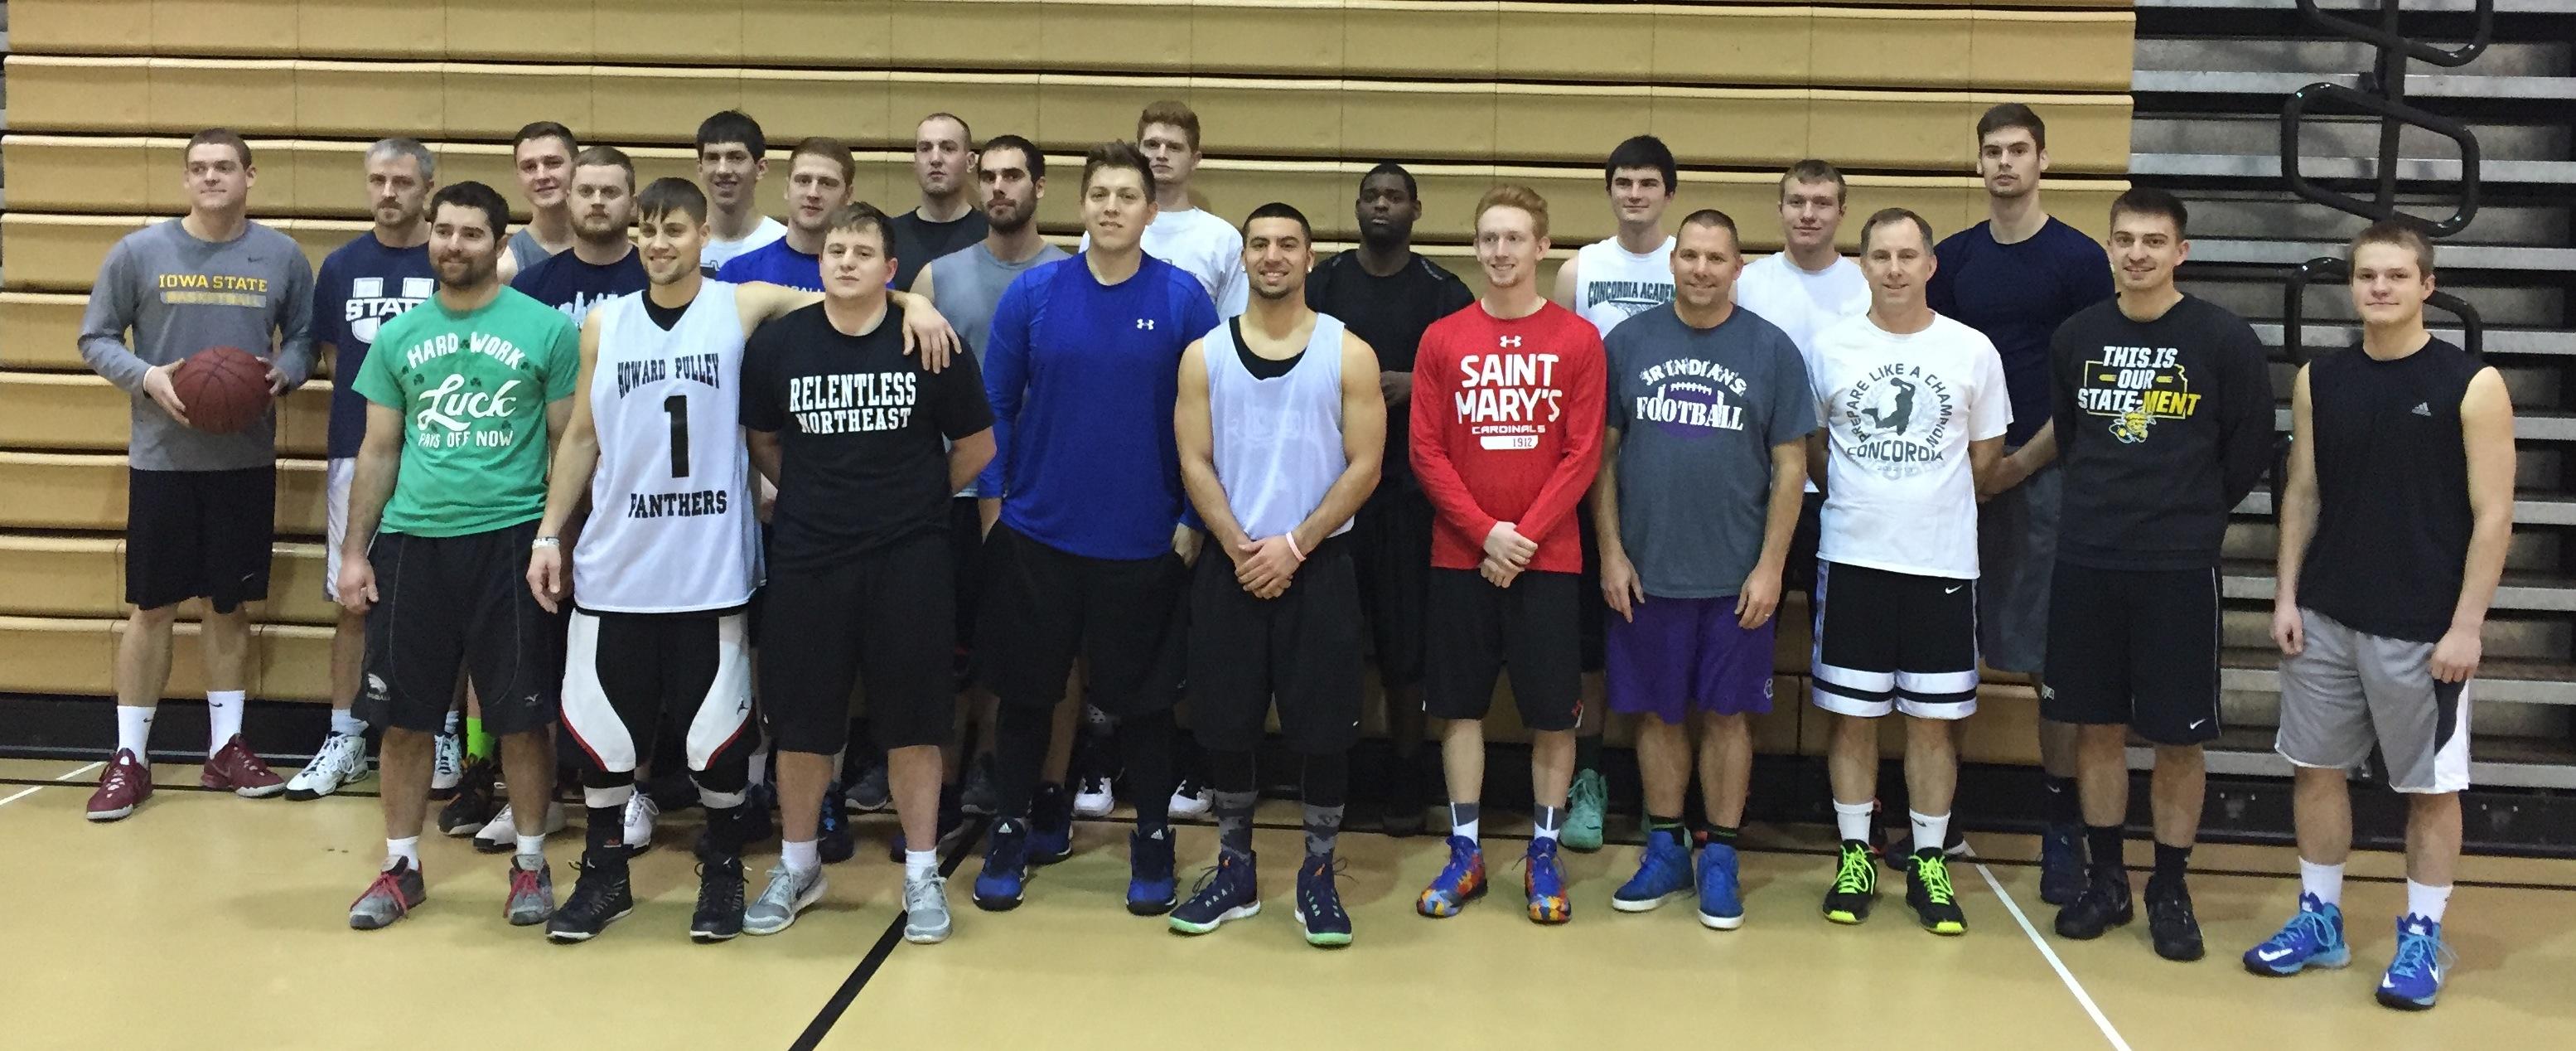 Alumni Game 2015